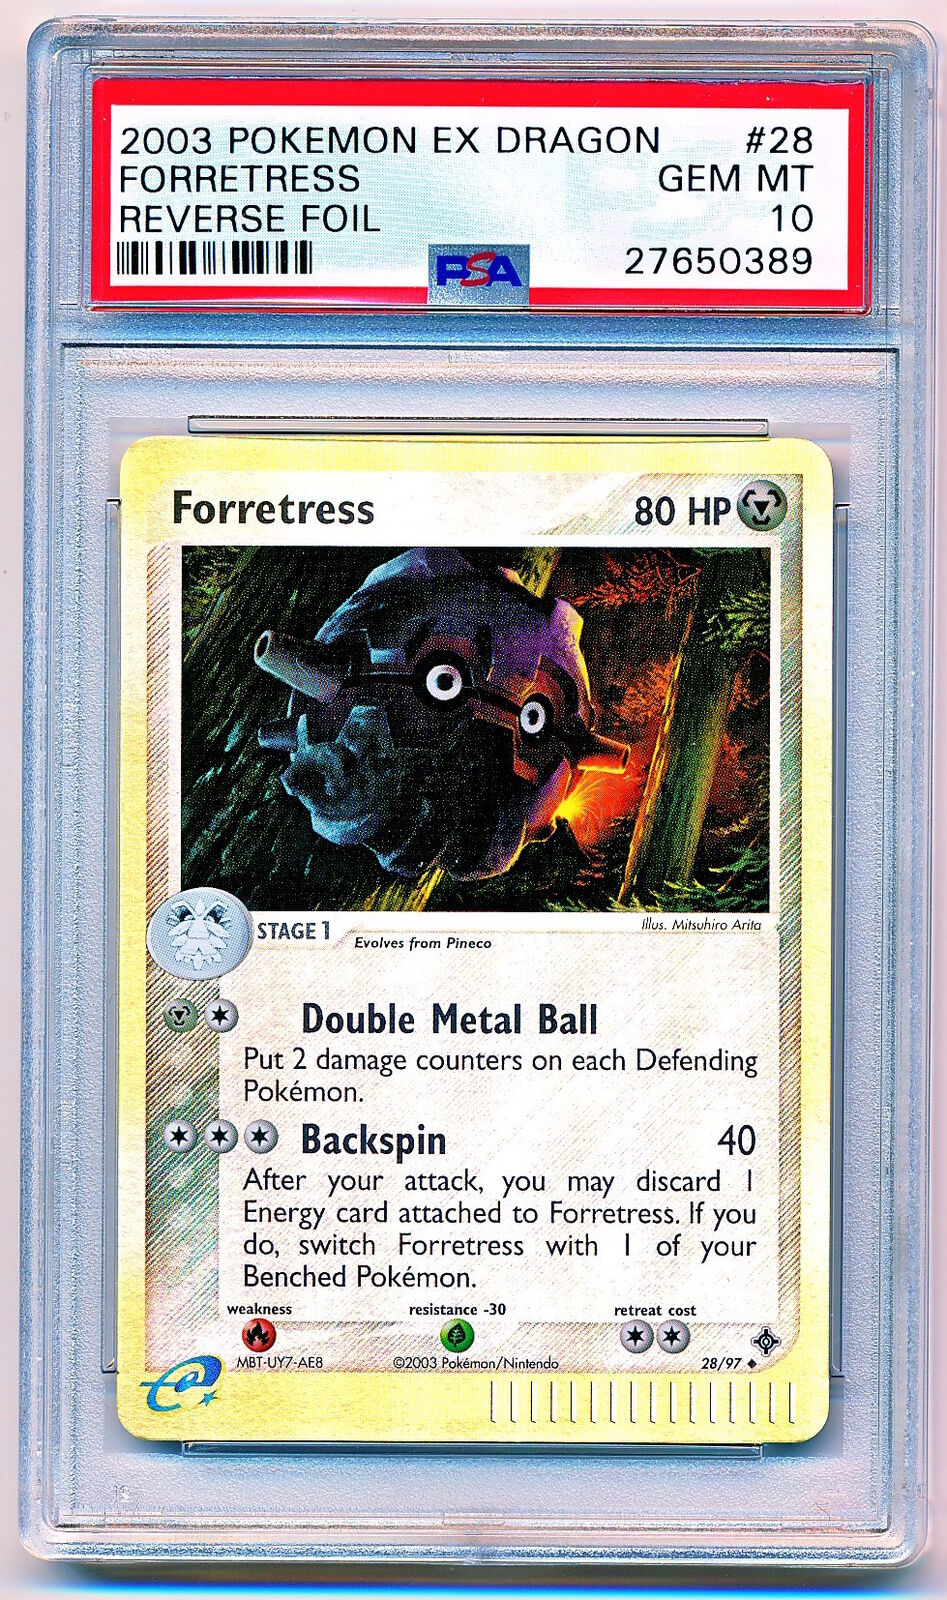 2003 Pokemon EX Dragon Forretress Forretress Forretress Reverse Holo  97 PSA 10 - POP 1 2a5f09